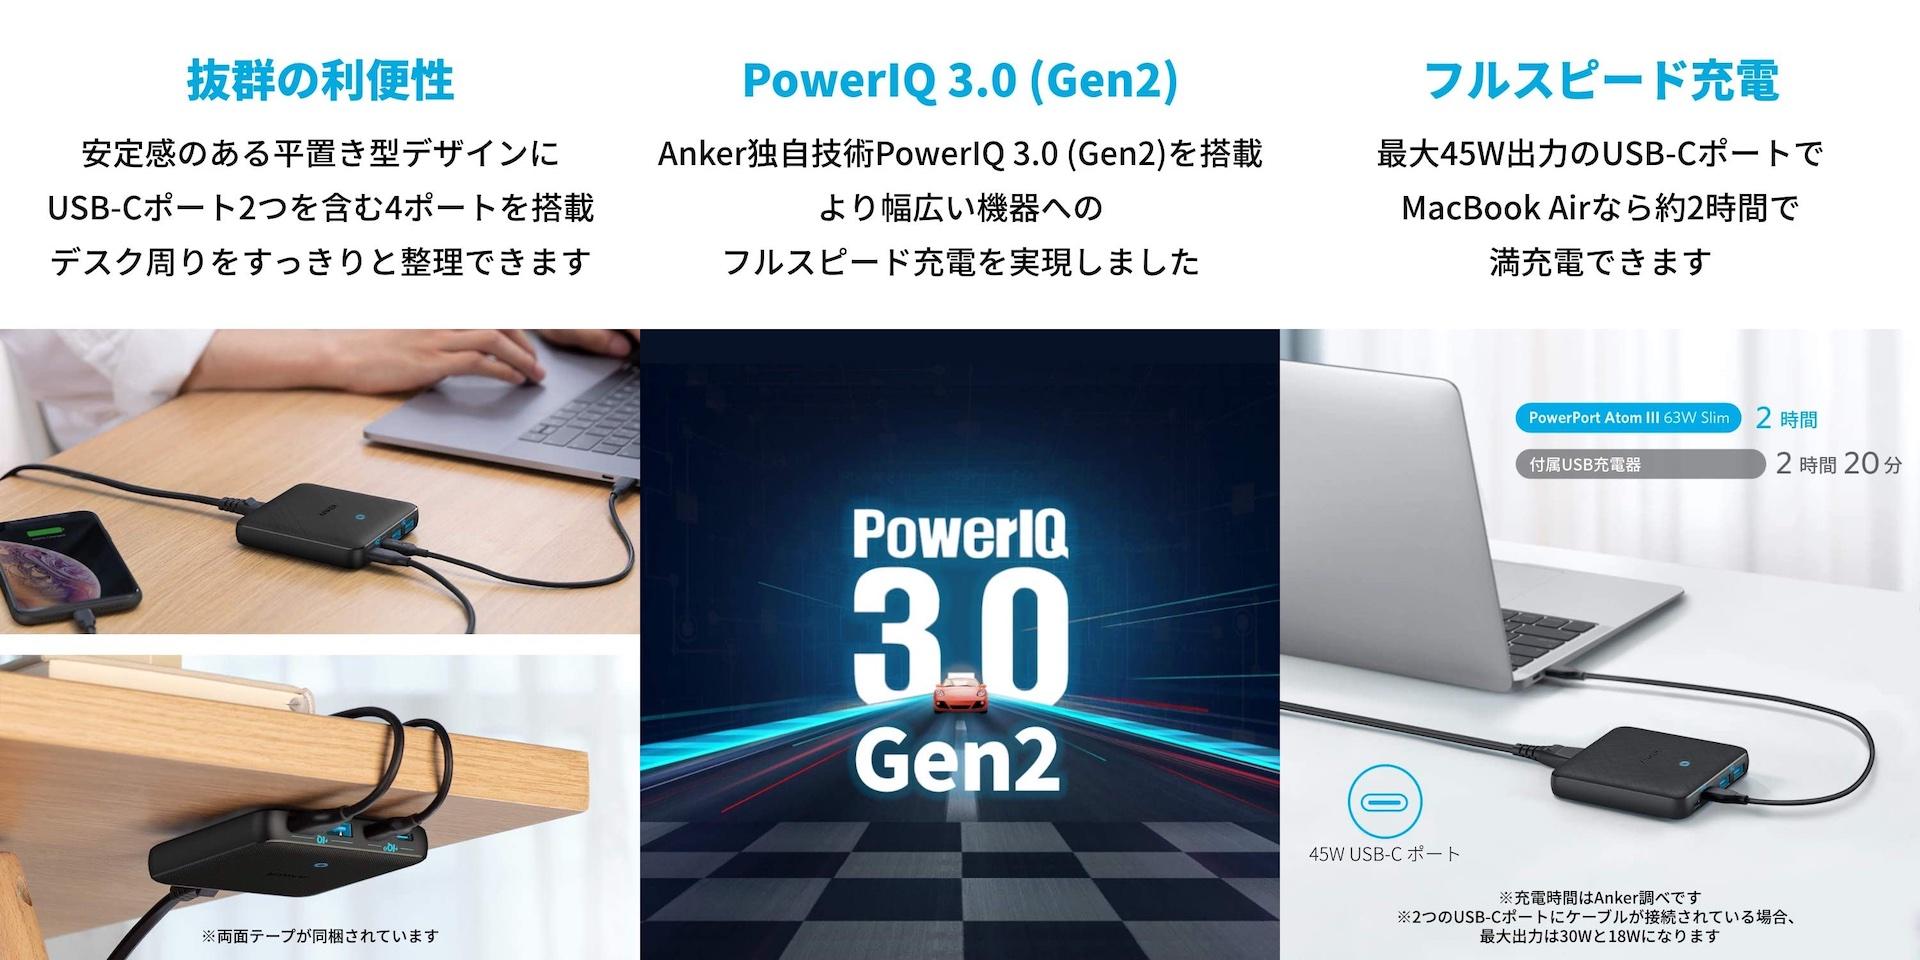 Anker PowerPort Atom III 63W Slimの仕様